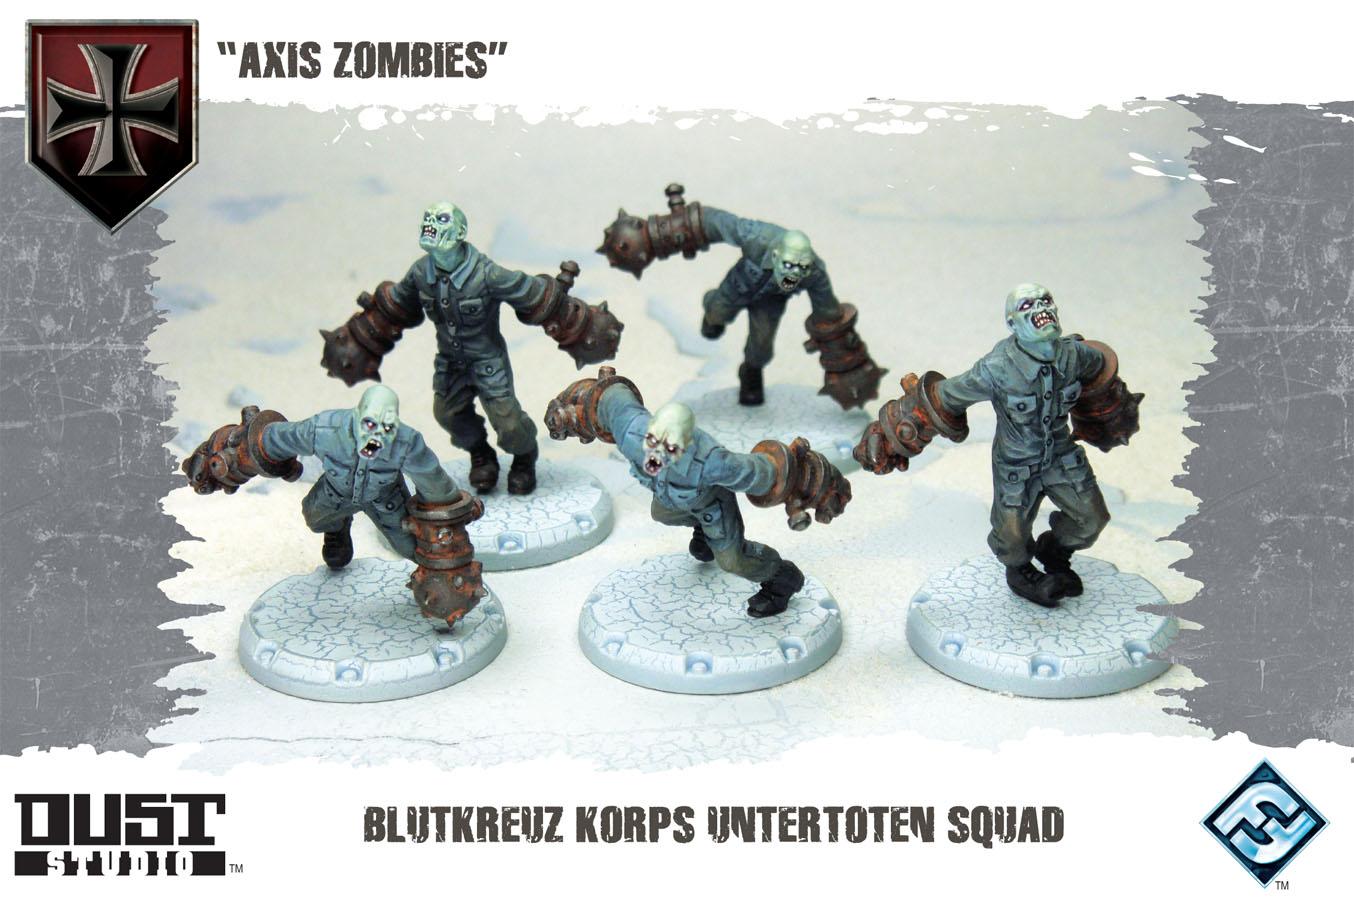 [CDA2015 WoL] BioZpharma  Dust+Tactics+-+axis+zombies